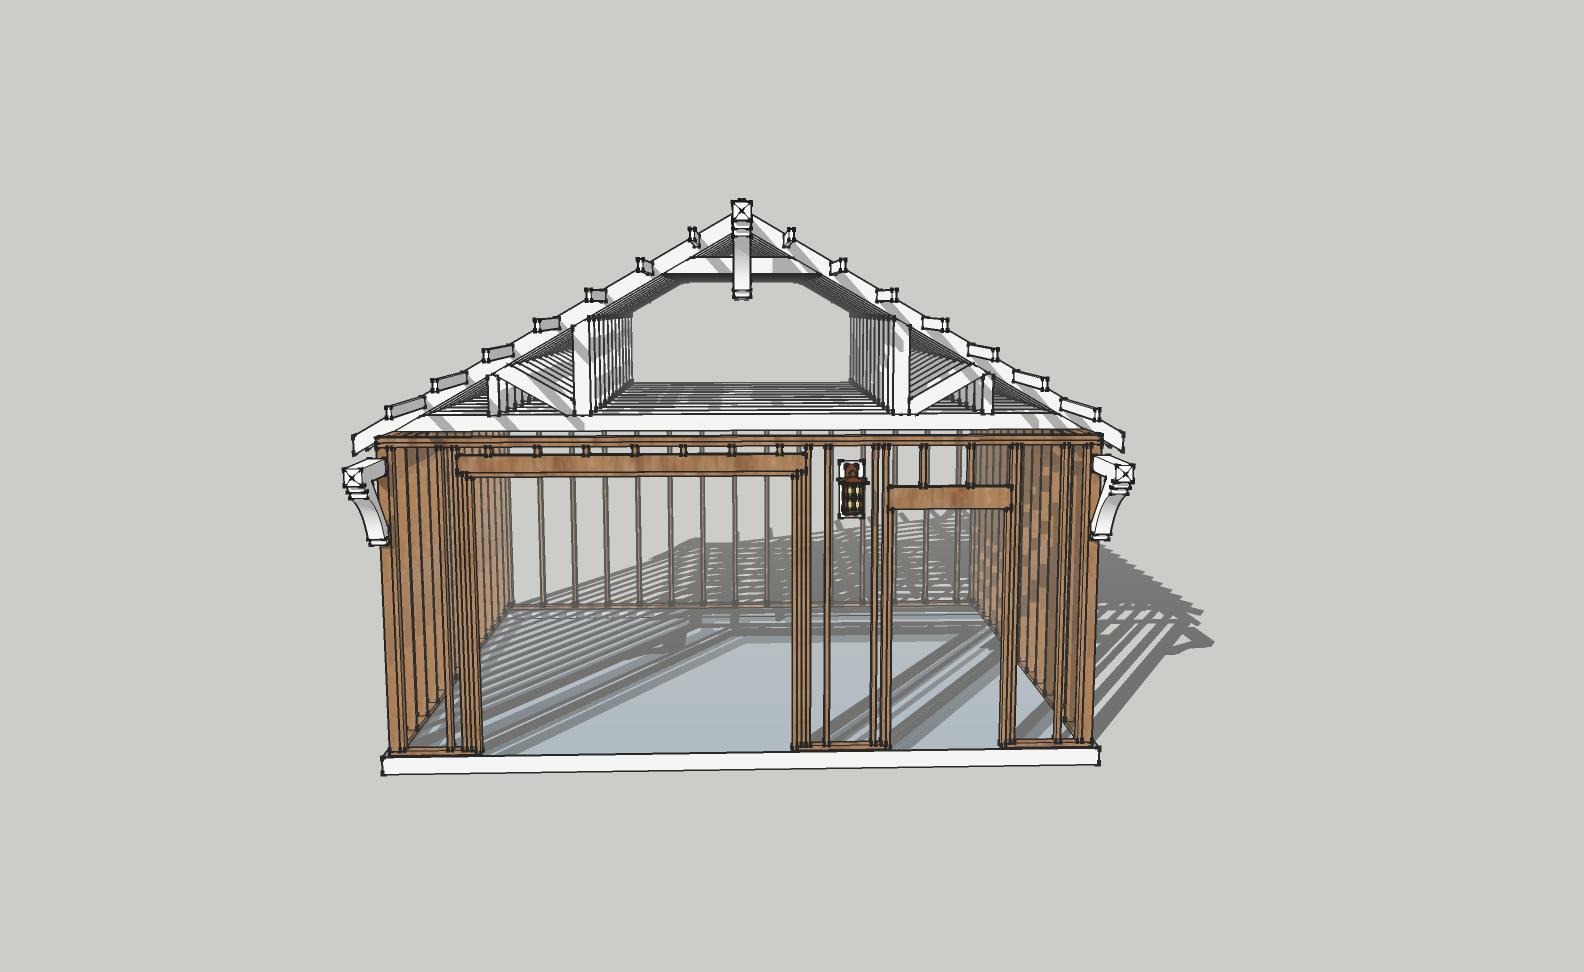 Laurelhurst craftsman bungalow sketchup rocks A frame house plans with garage